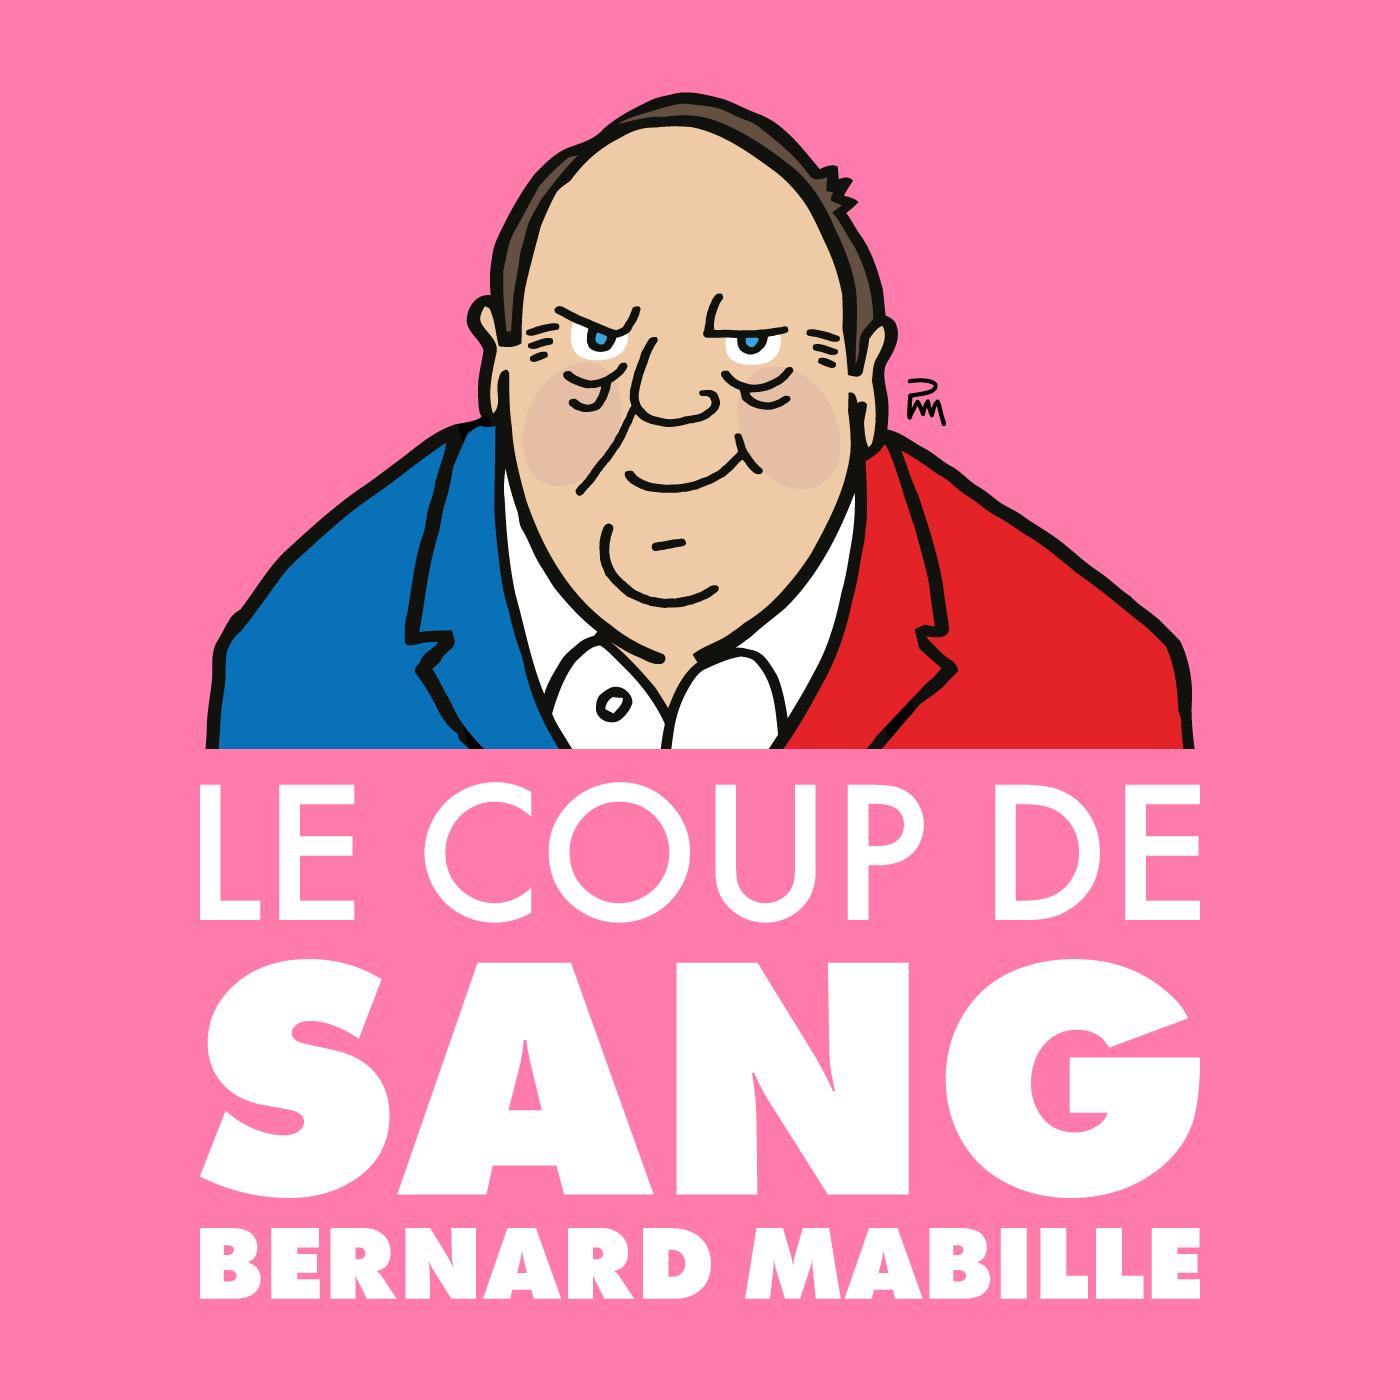 Le coup de Sang de Bernard Mabille